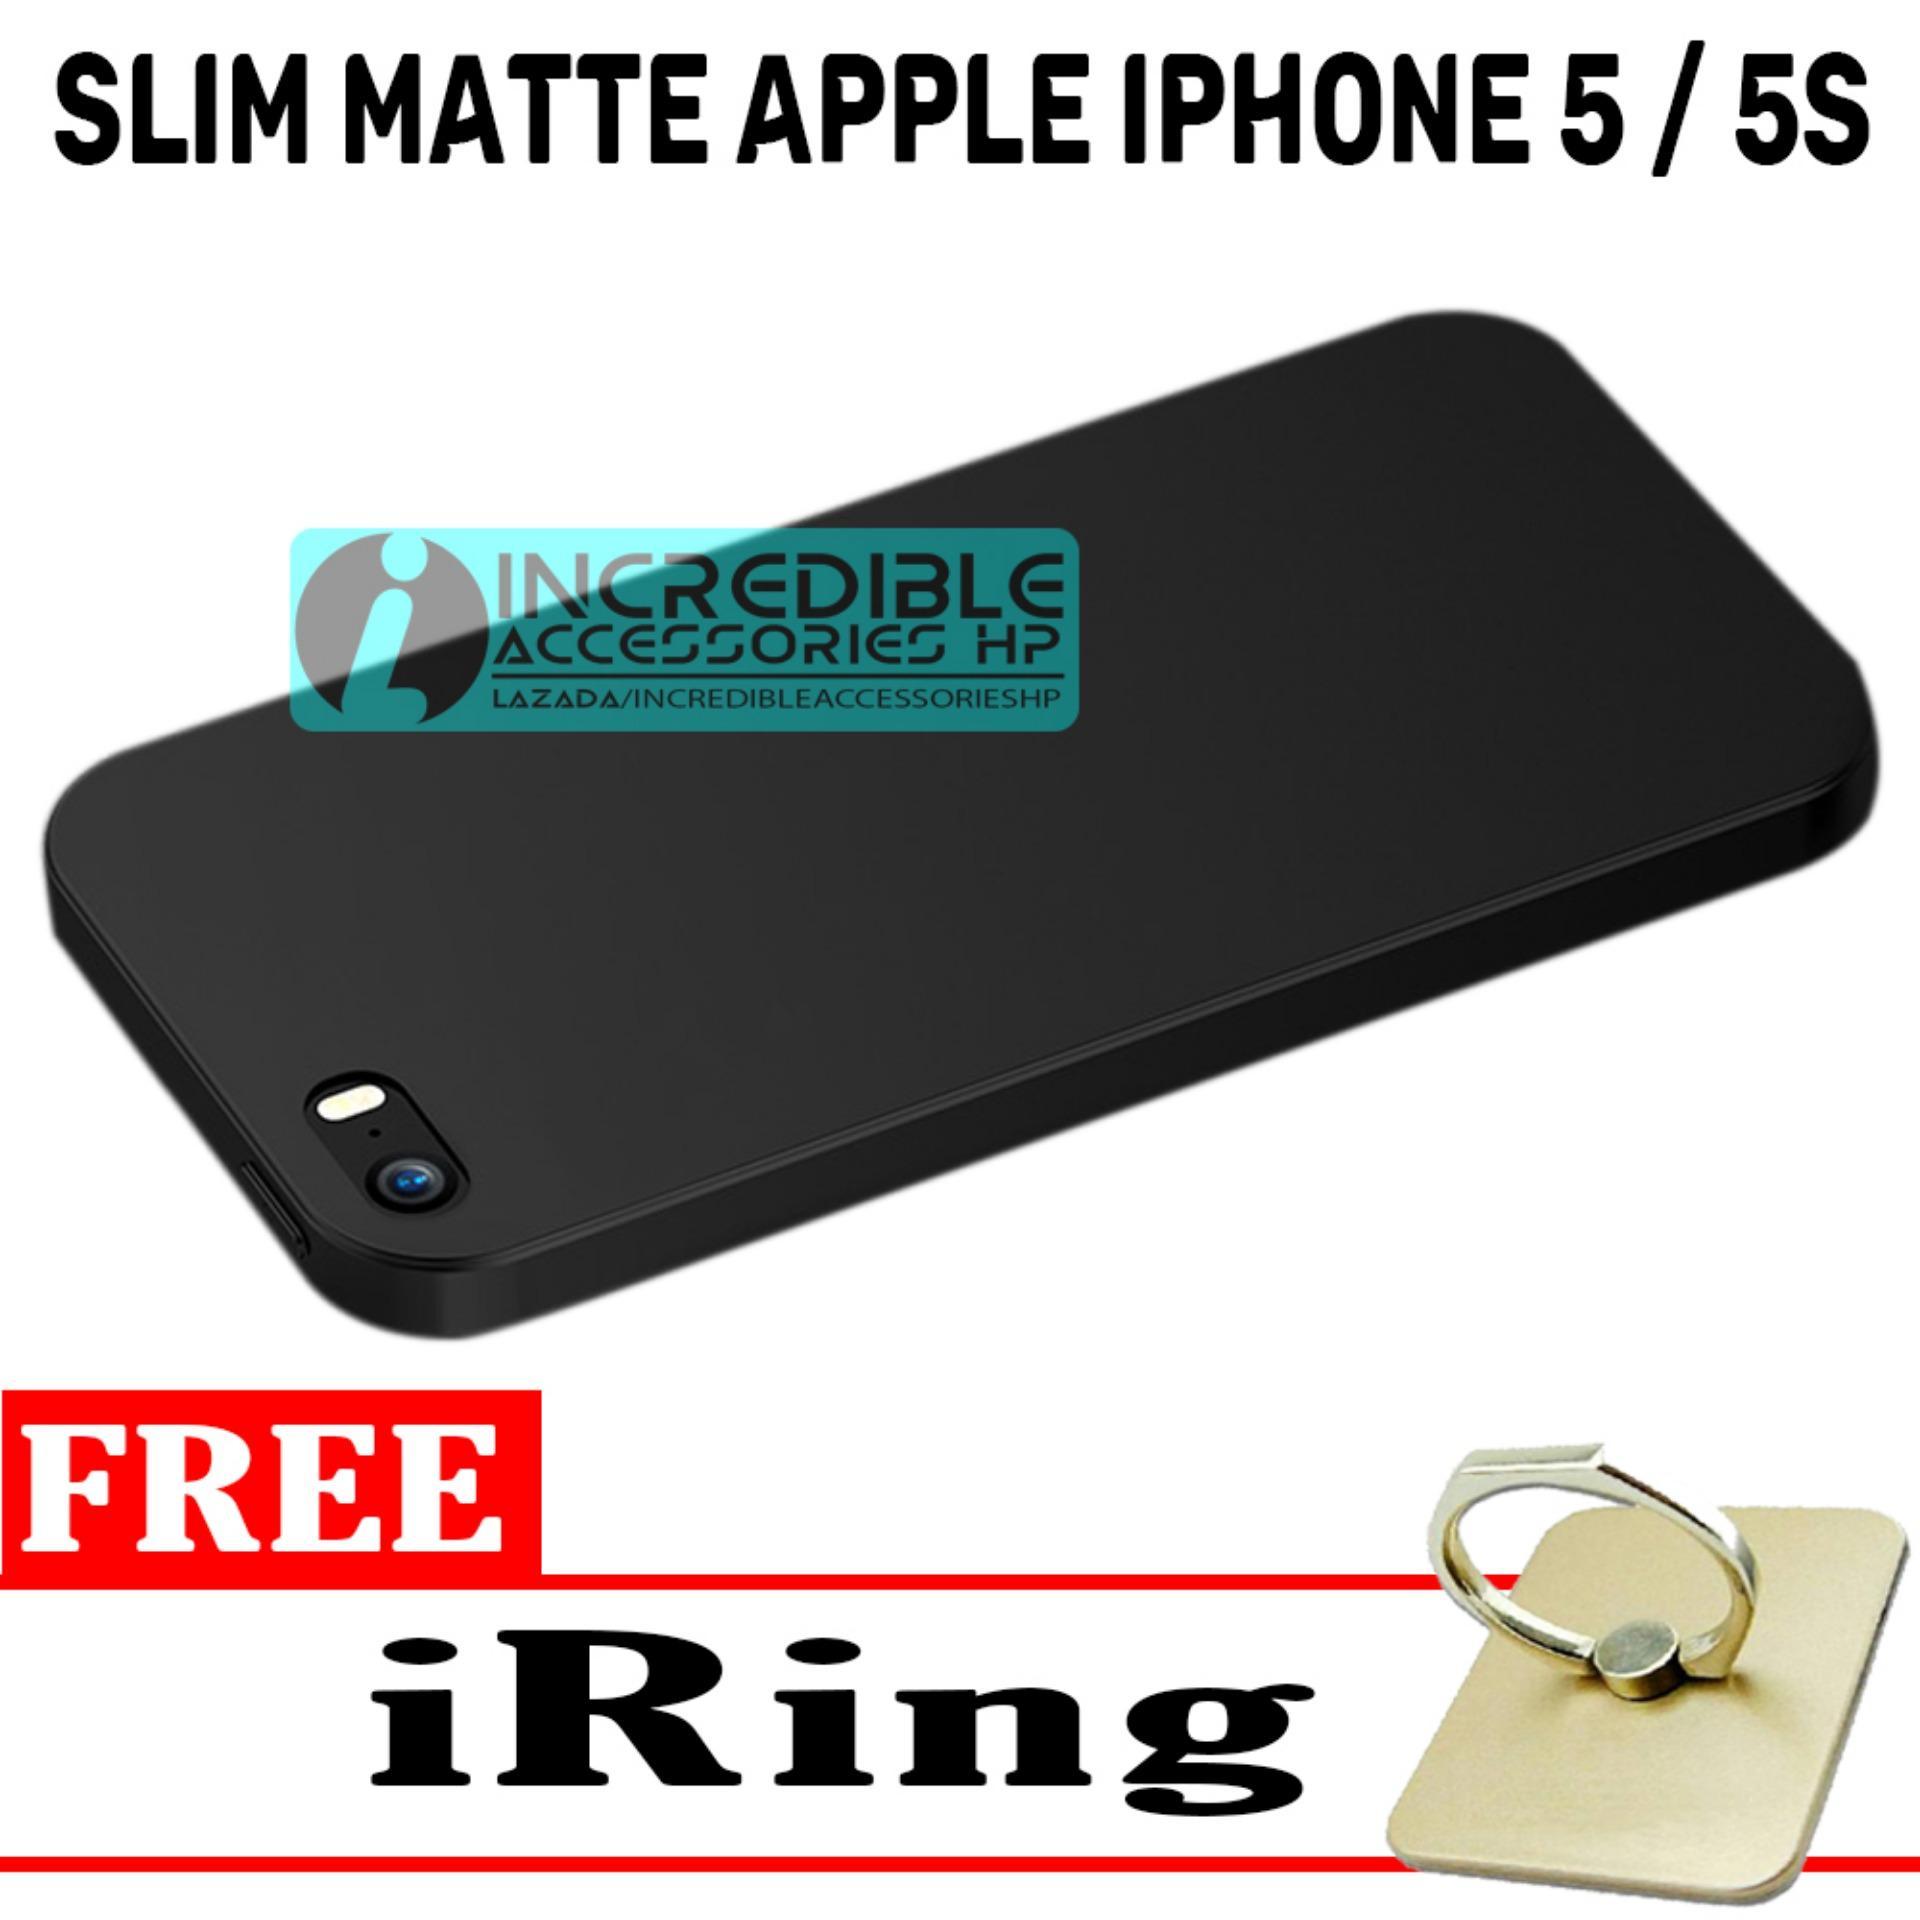 Anti Fingerprint Ultraslim Hybrid Case Baby Soft Babby Skin Softase Silicon Matte  for Apple iPhone 5 / 5s - Black + Free iRing